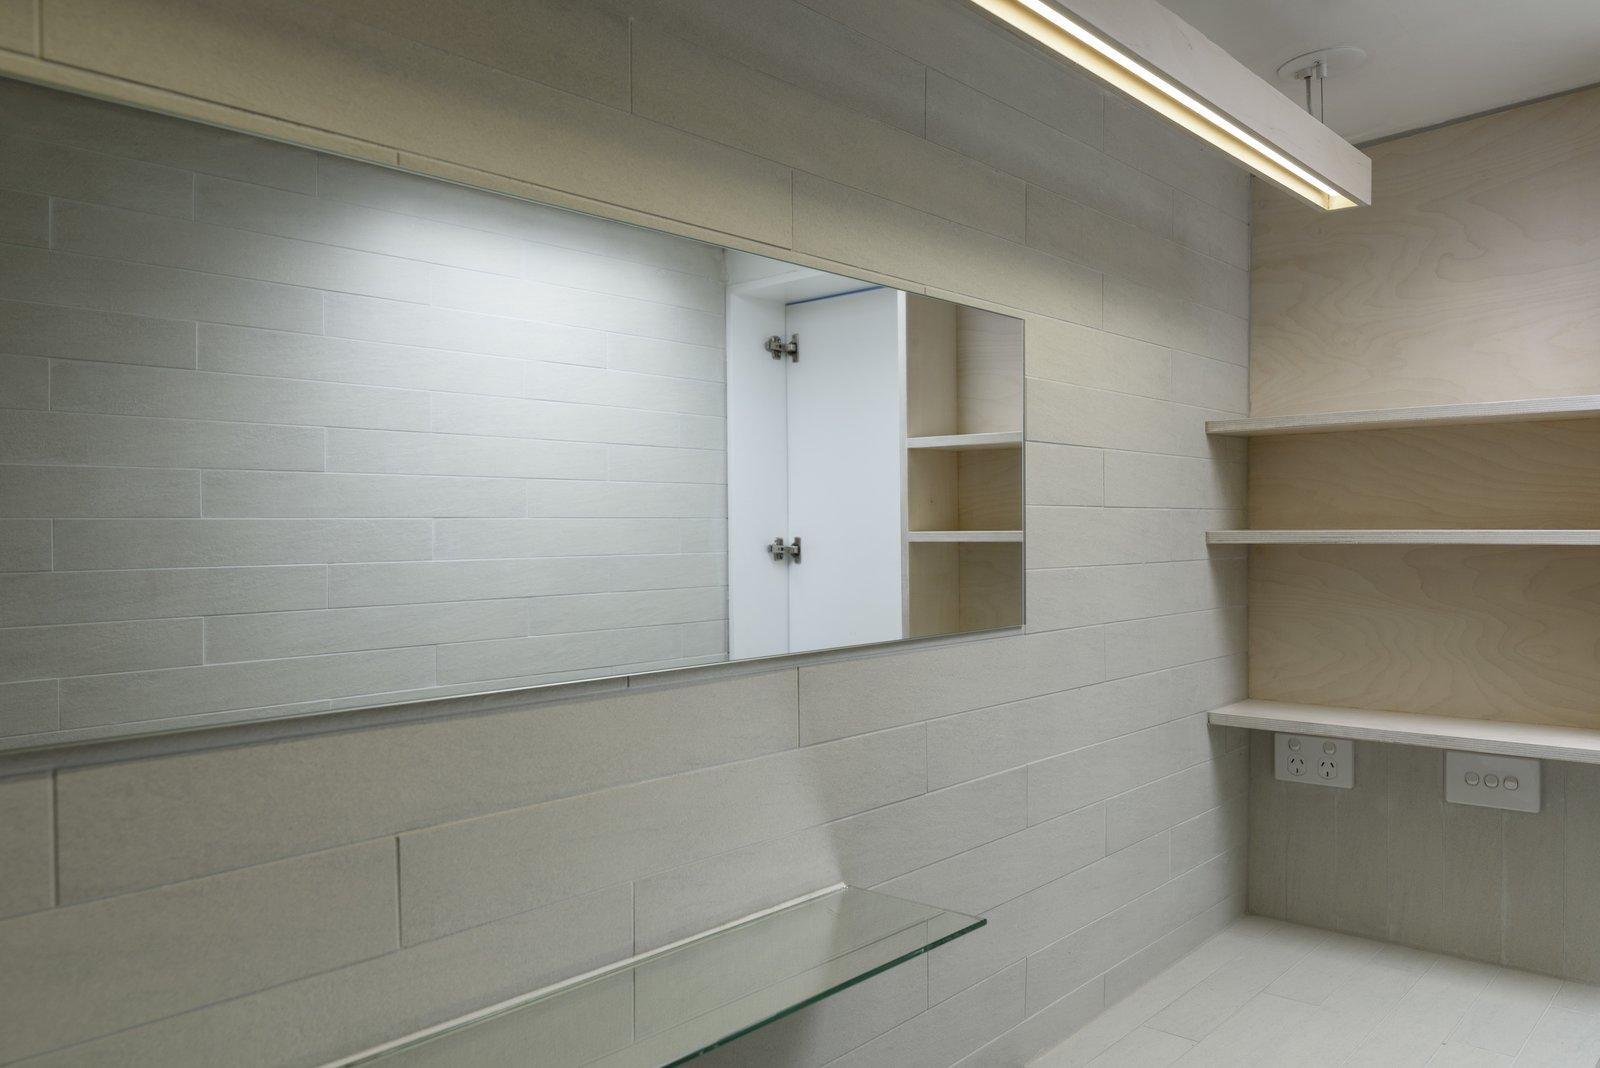 Bath Room, Tile Counter, Pendant Lighting, and Porcelain Tile Wall Bathroom detail  Curtain Cottage